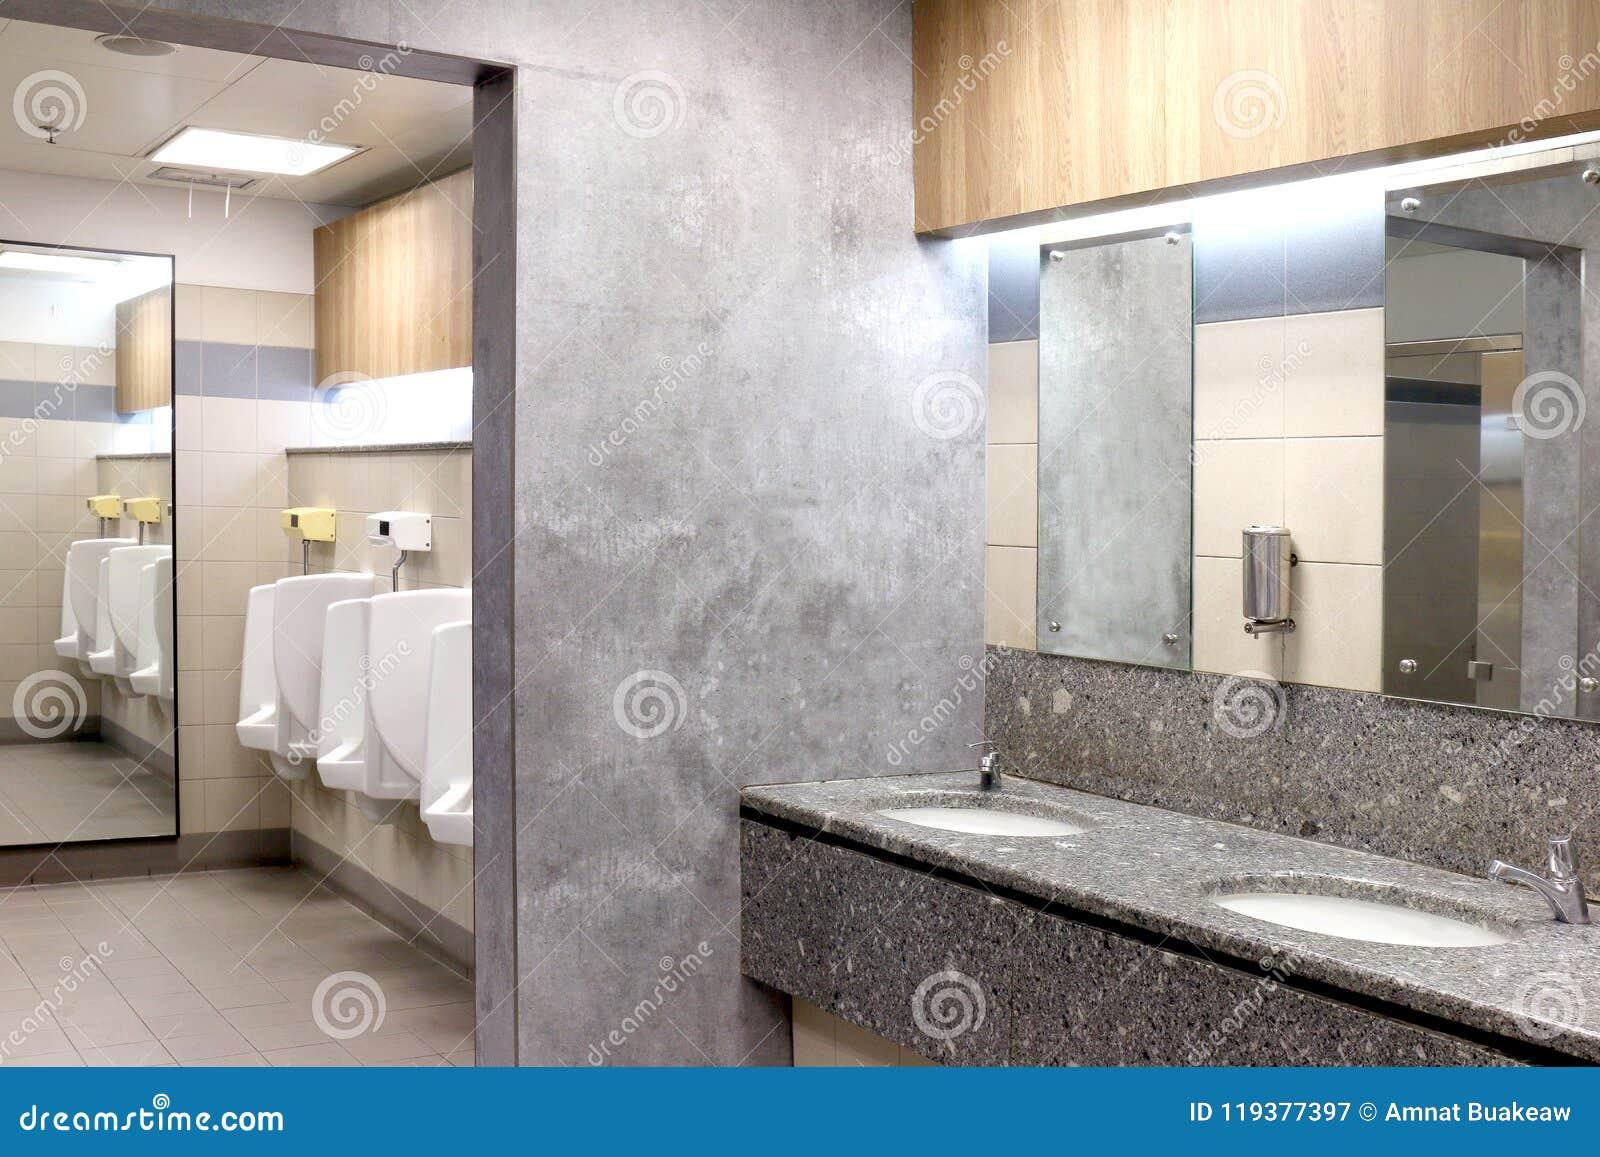 Toilet, Modern Toilet, Lavatory, Water Closet Toilet Room Stock ...